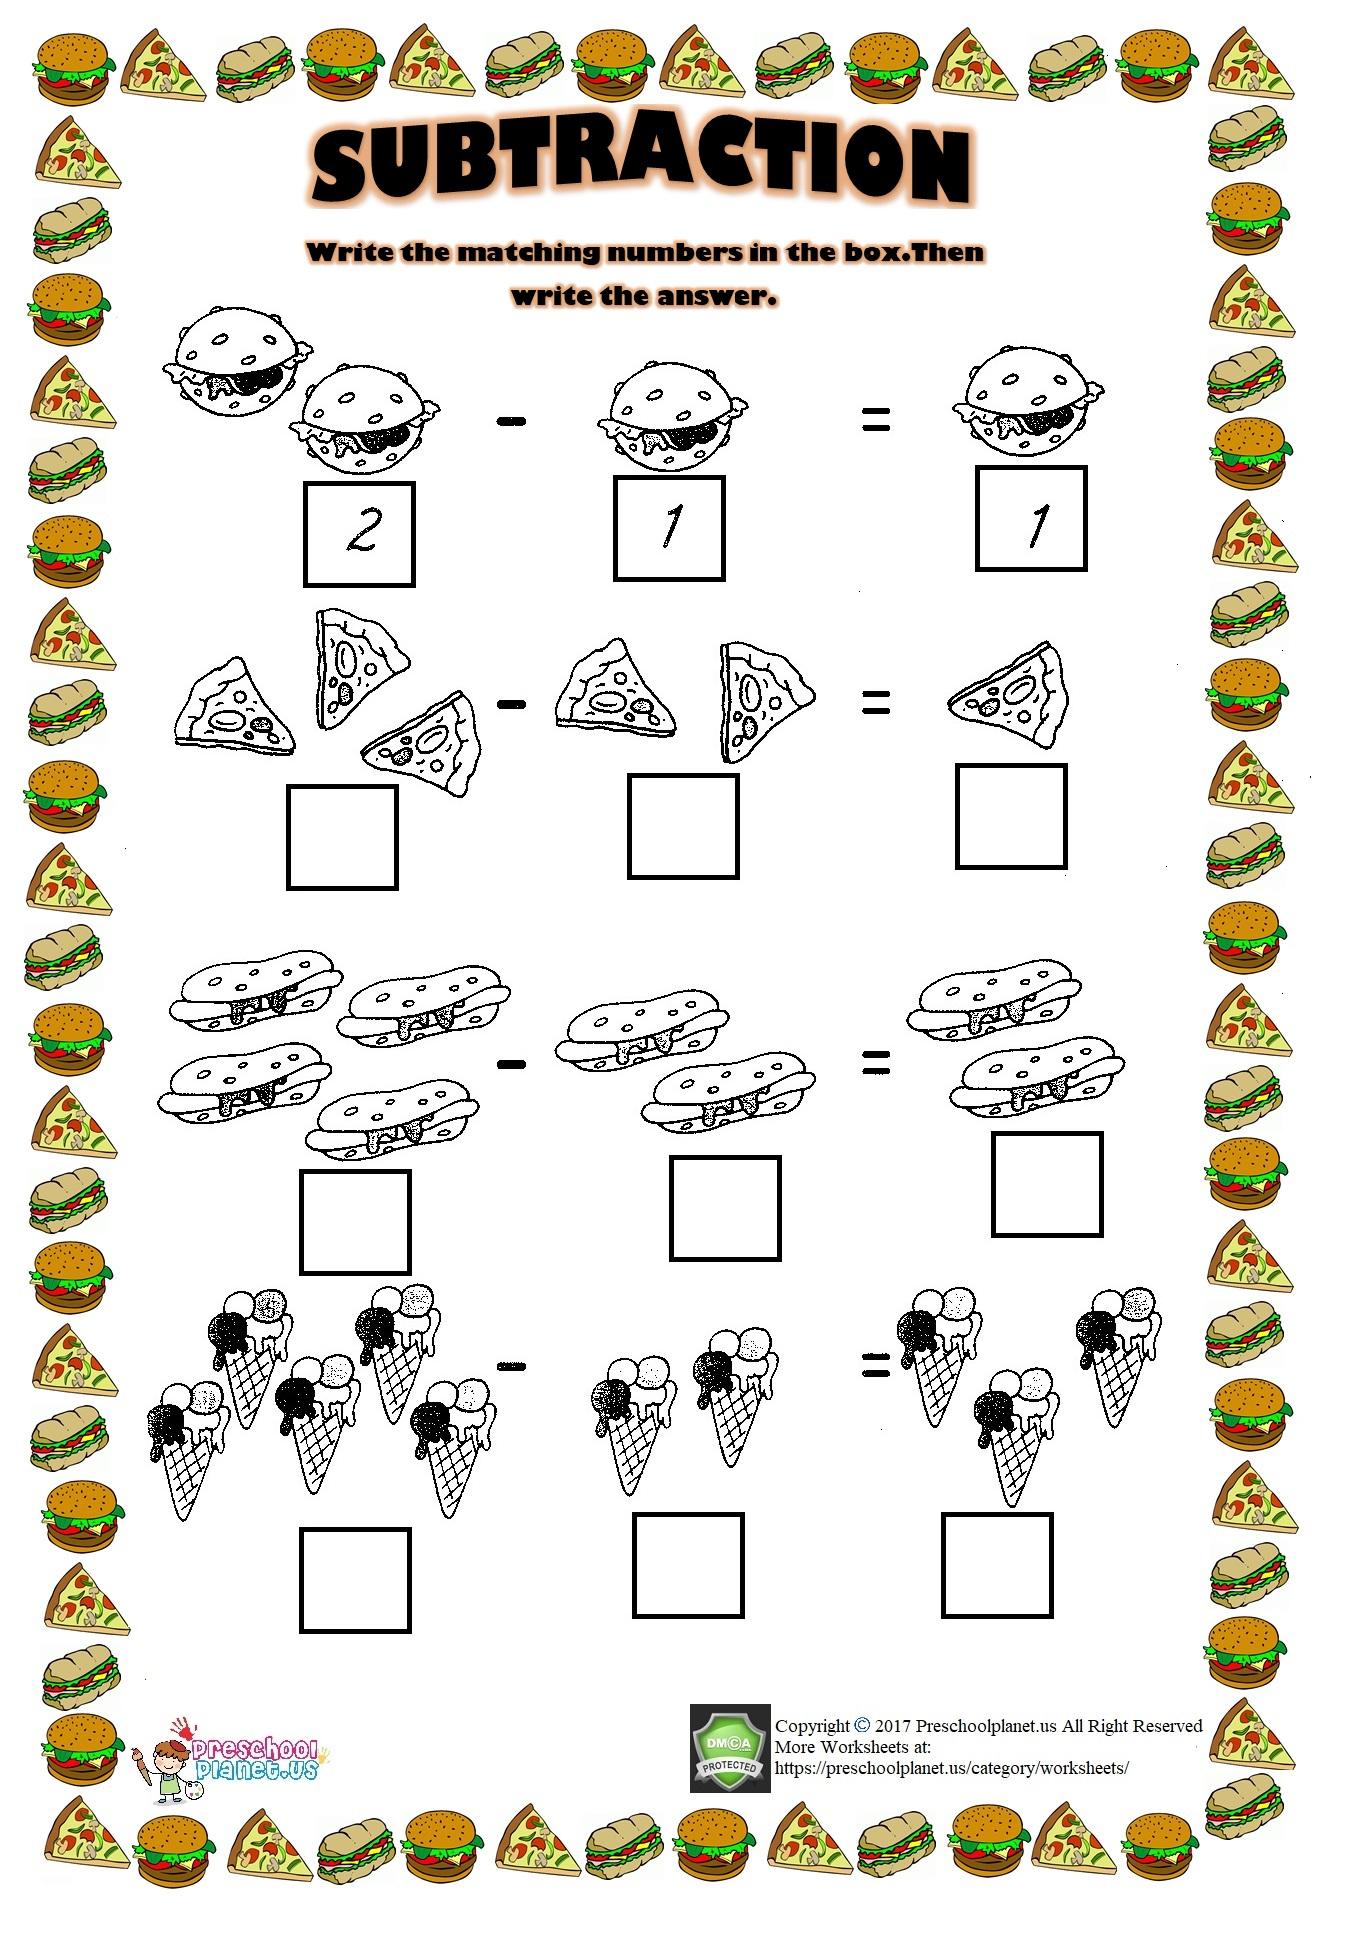 Easter Worksheets Preschoolplanet